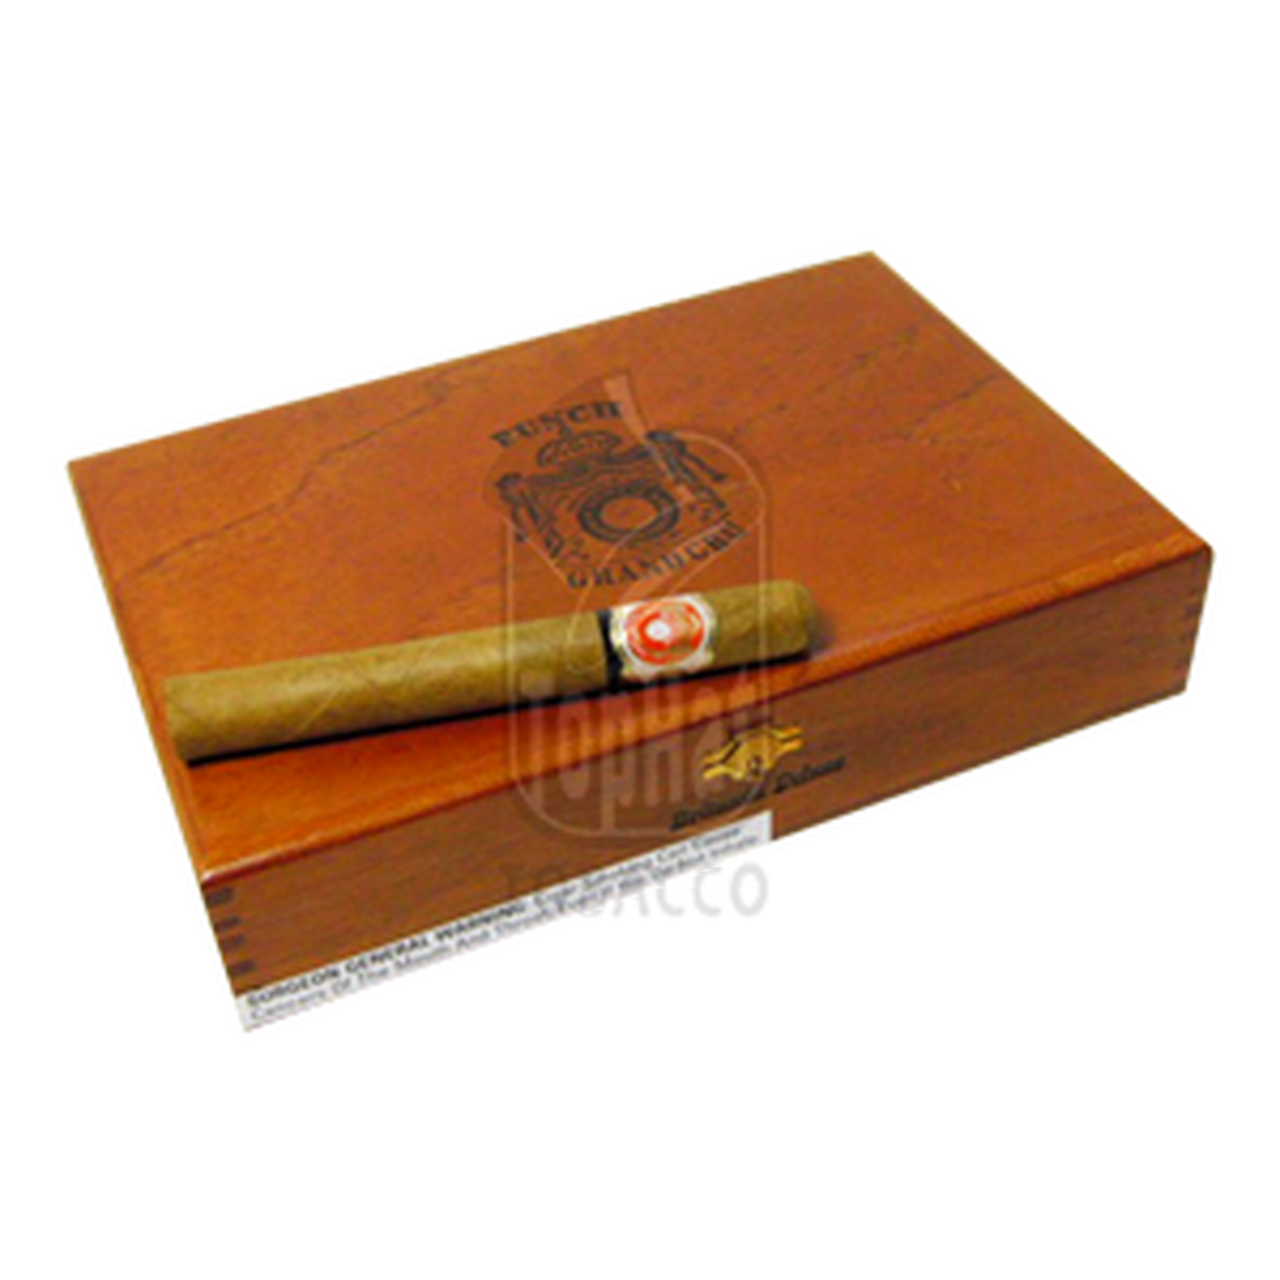 Punch Grand Cru Britania Cigars - 6.25 x 50 (Cedar Chest of 25)